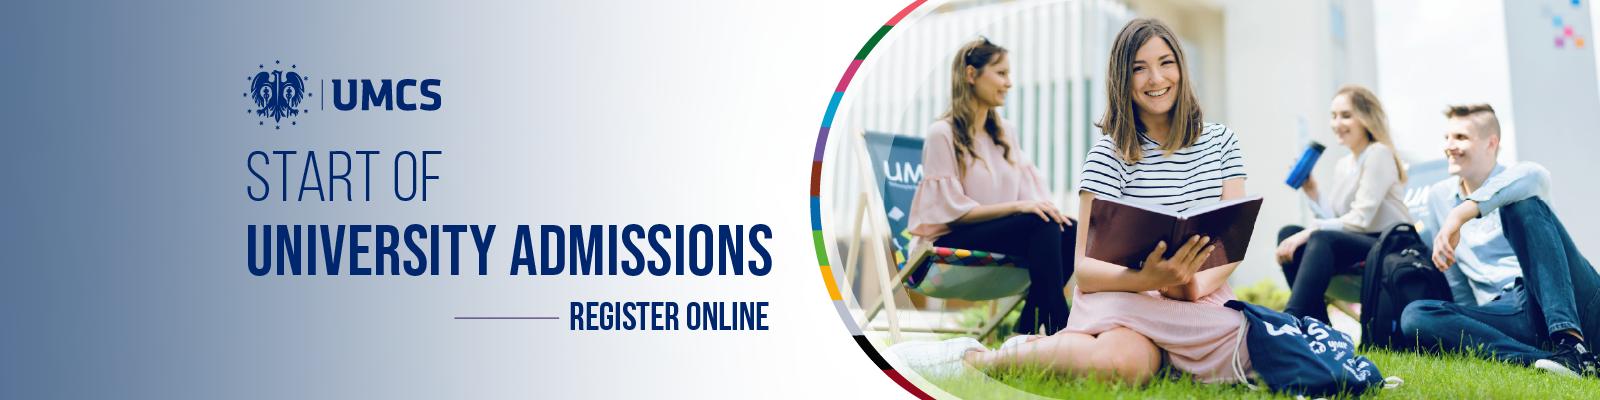 Start of University Admissions - register online!